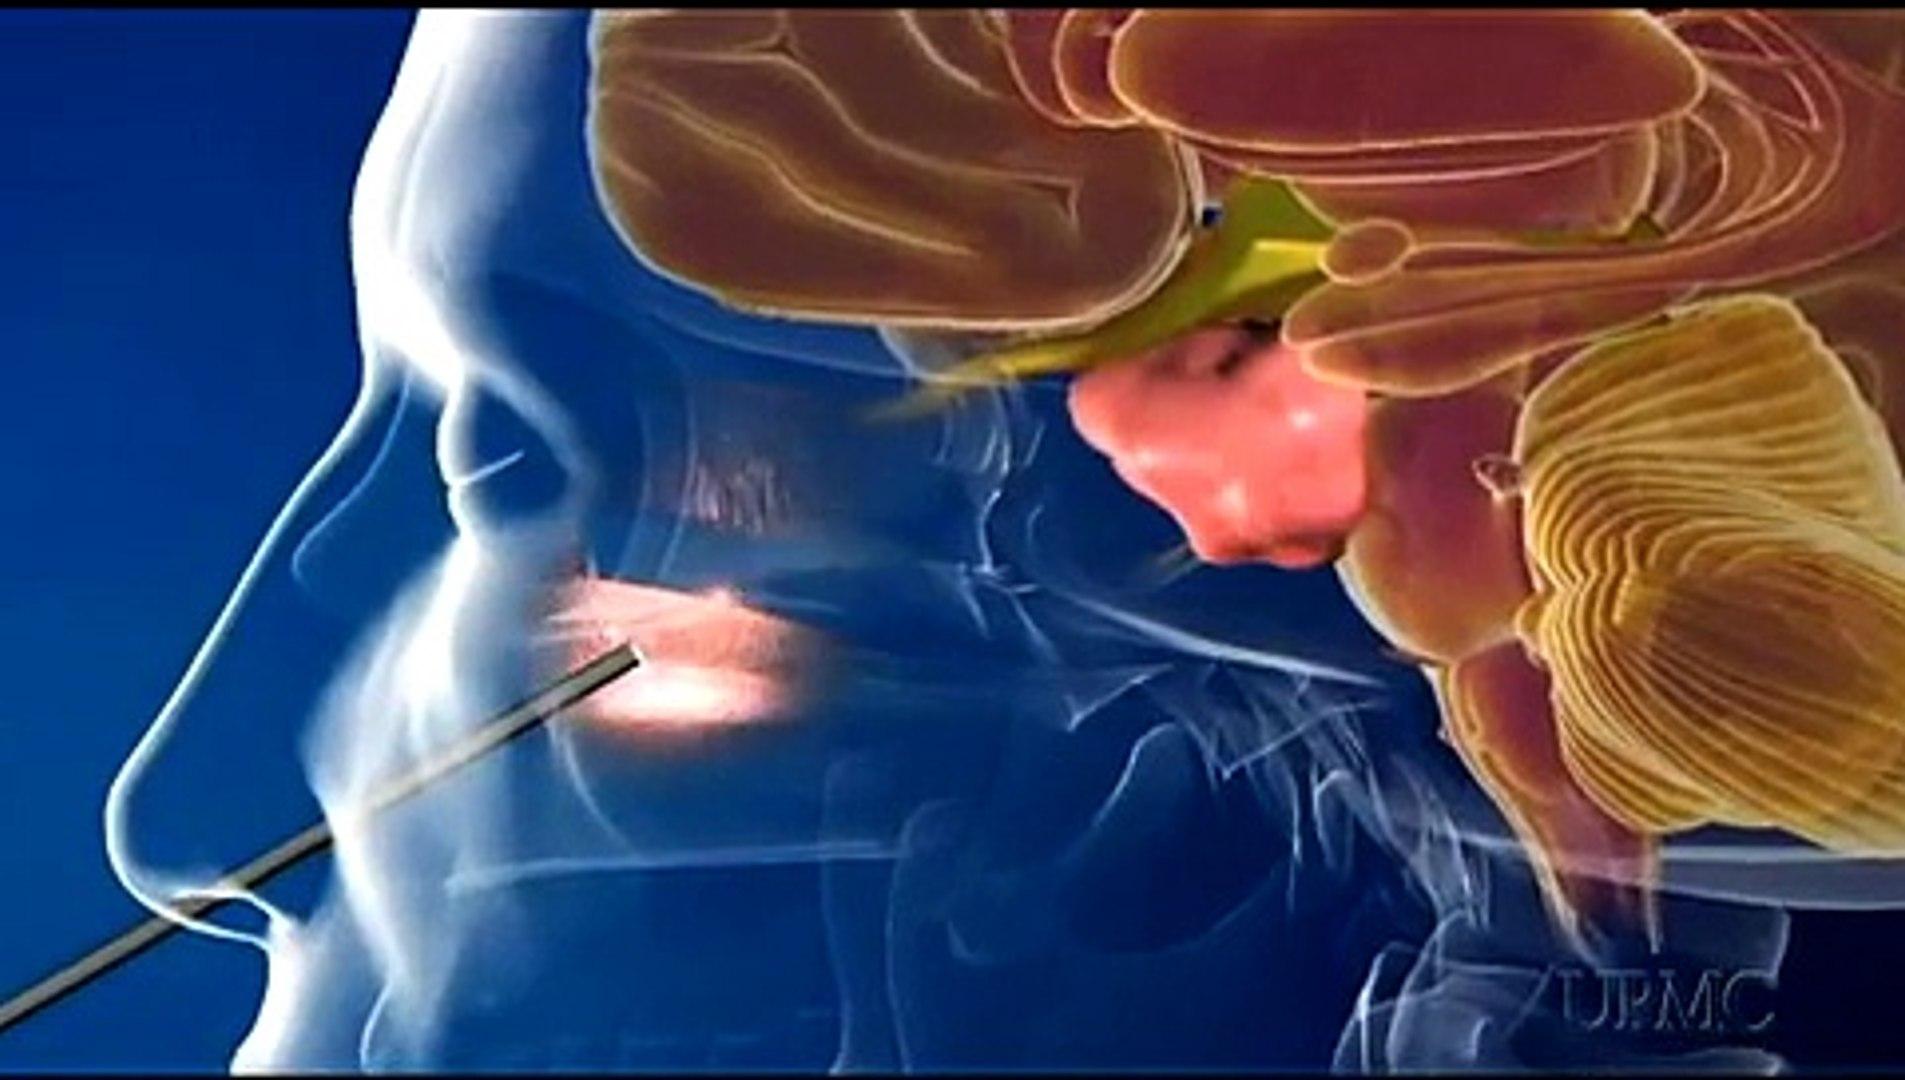 Minimally Invasive Brain Surgery at UPMC with Dr  Paul Gardner